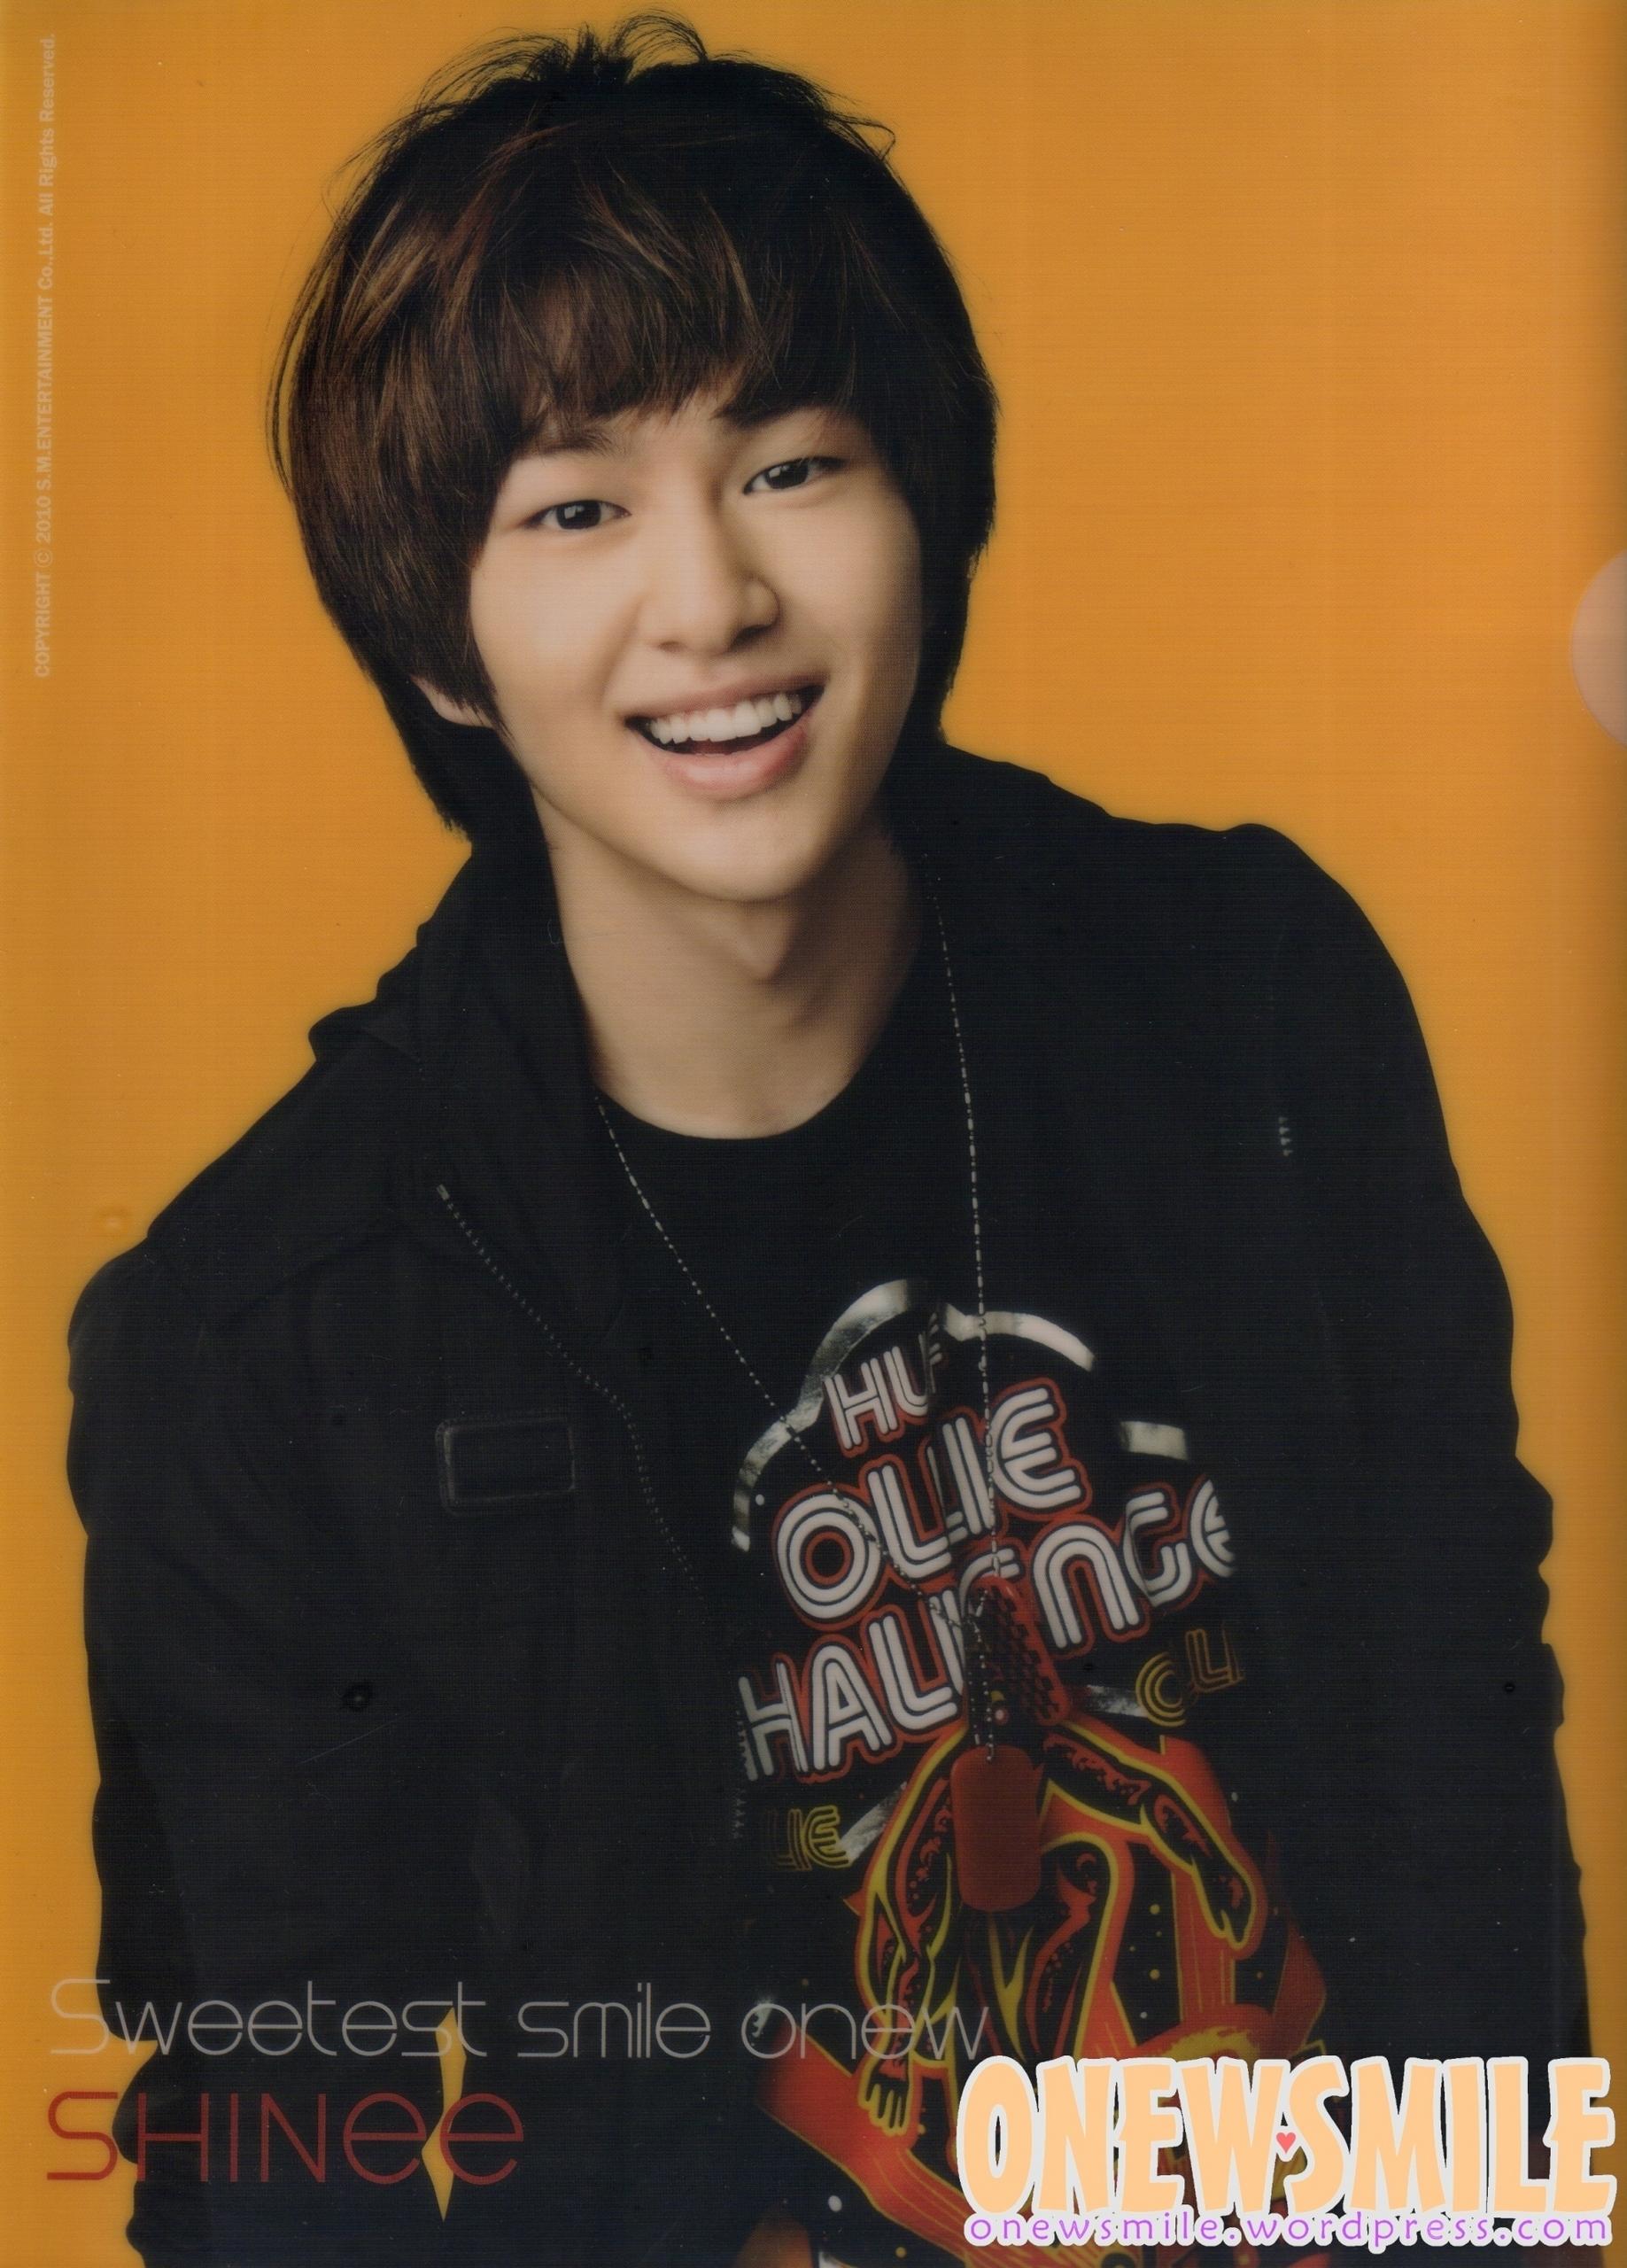 images of Shinee Romeo Download Gambar Foto Zonatrick